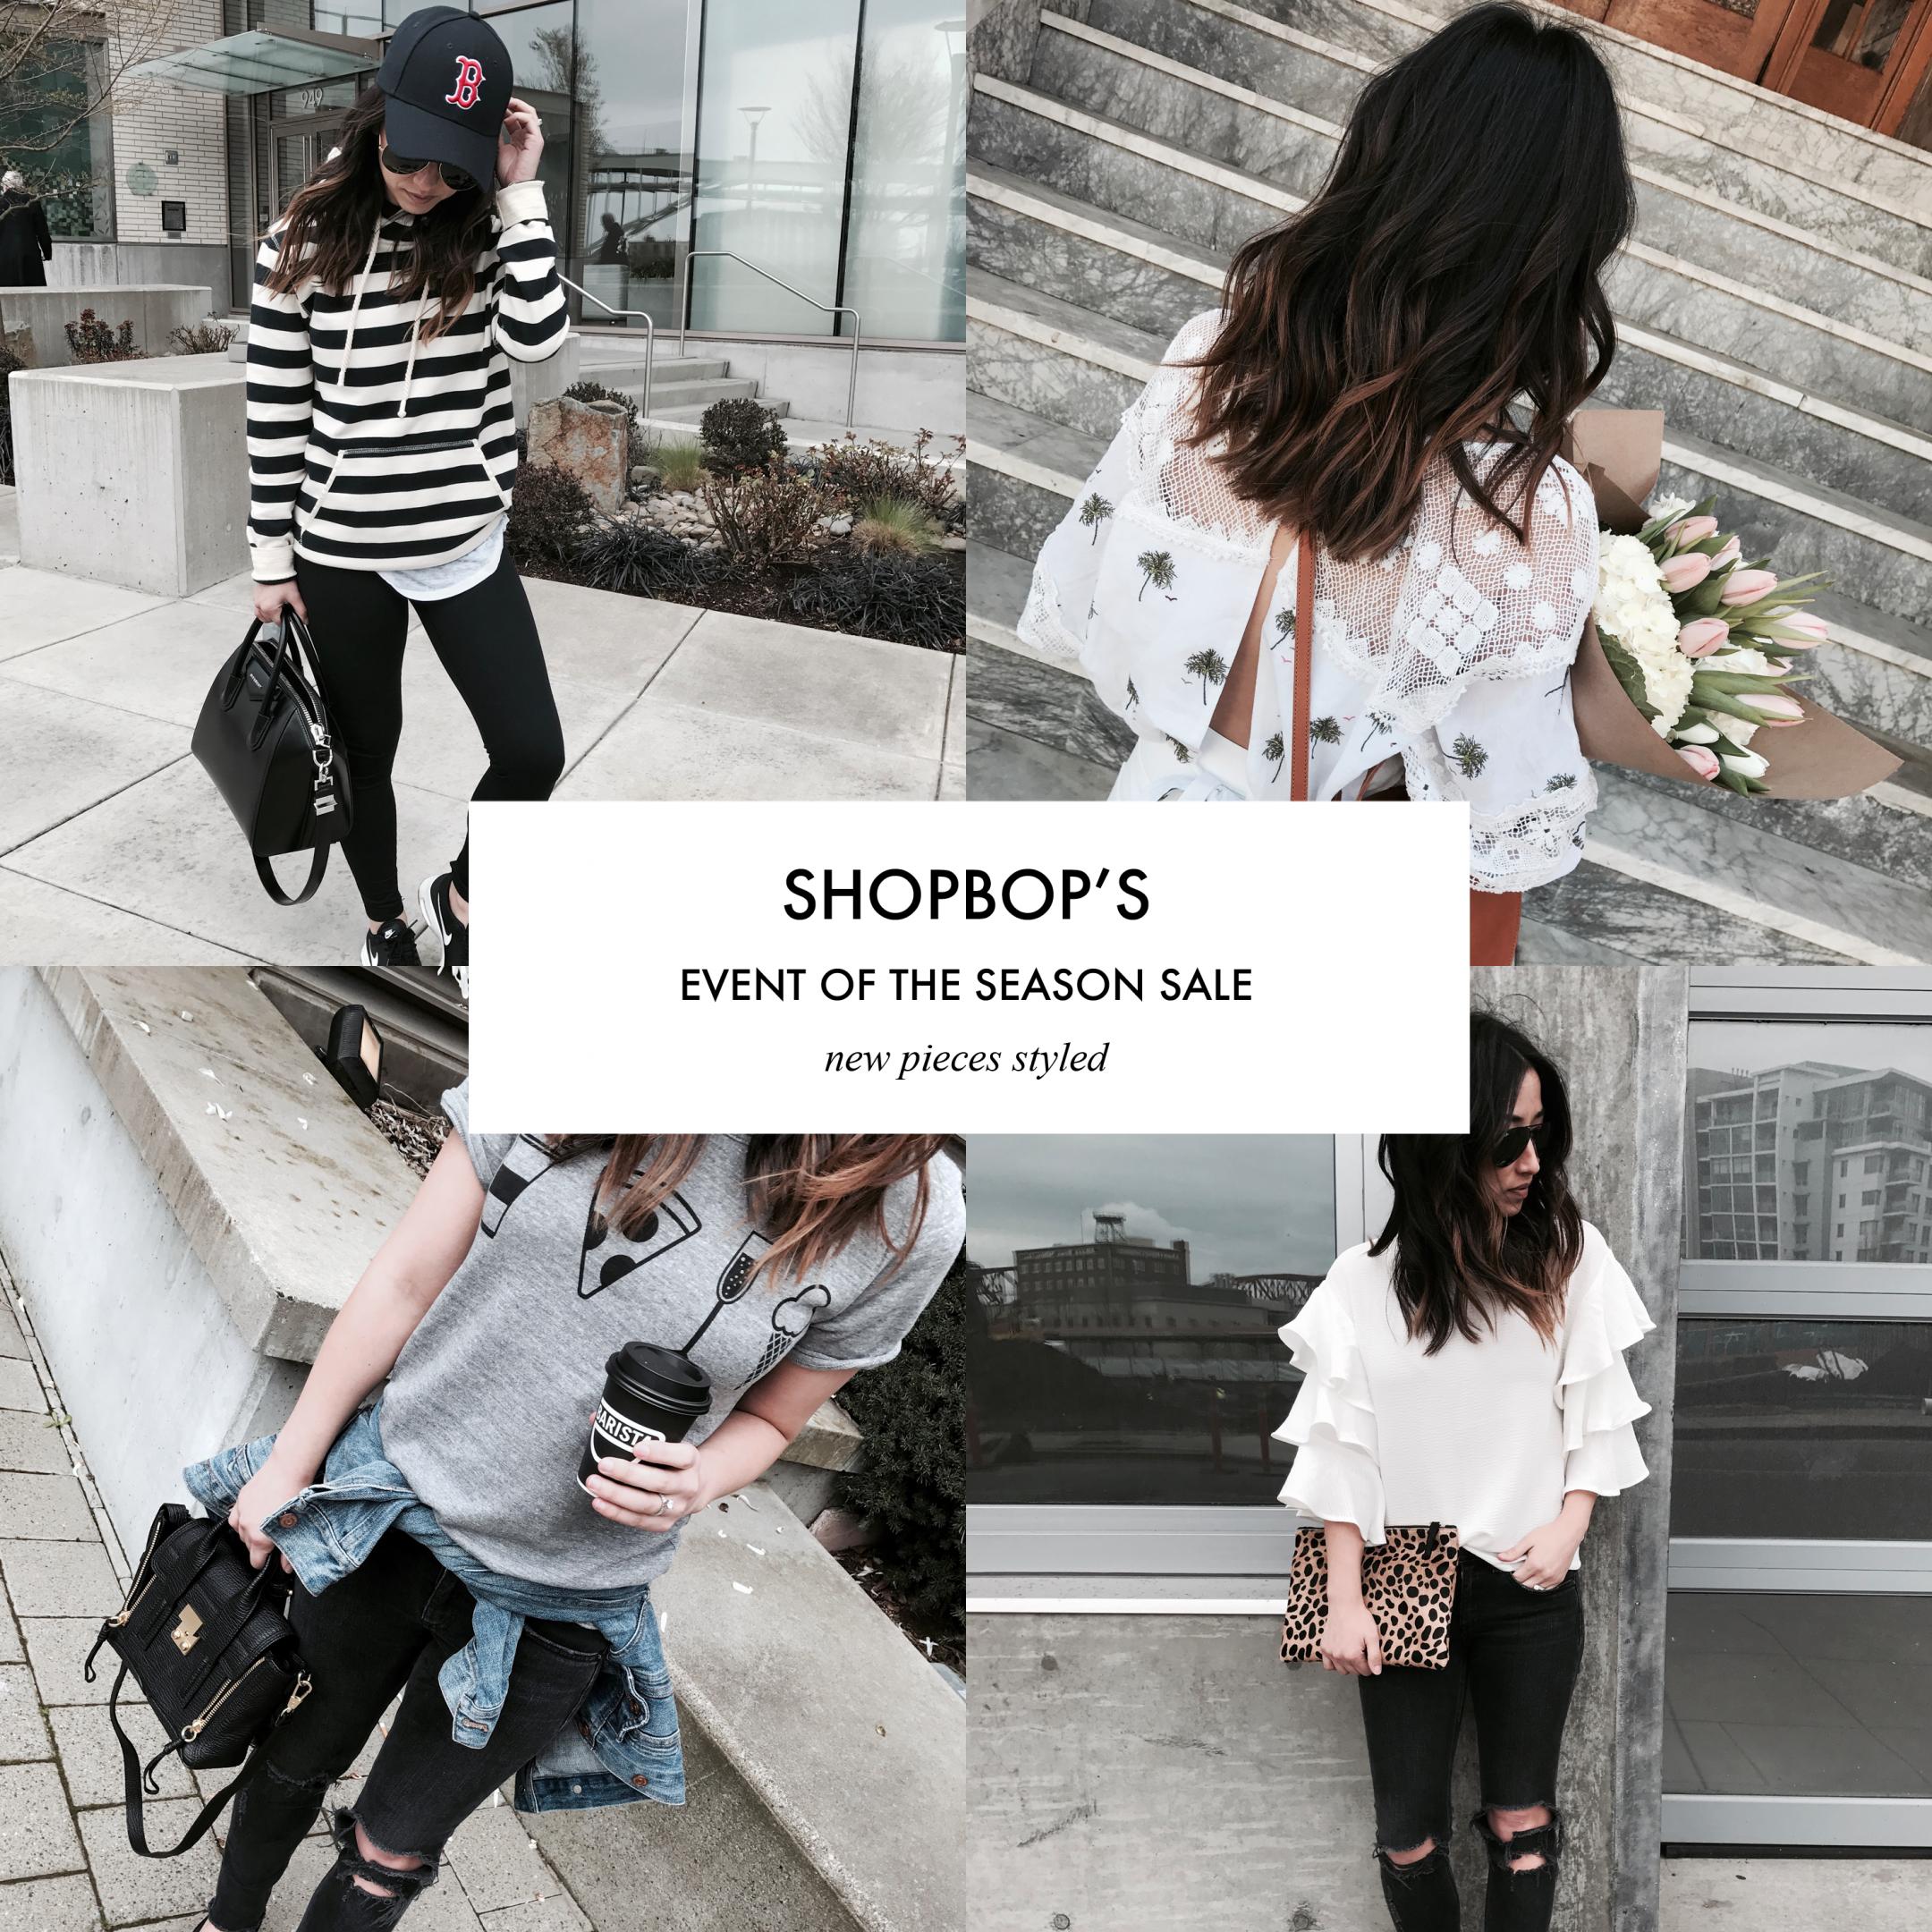 Shopbop's event of the season sale